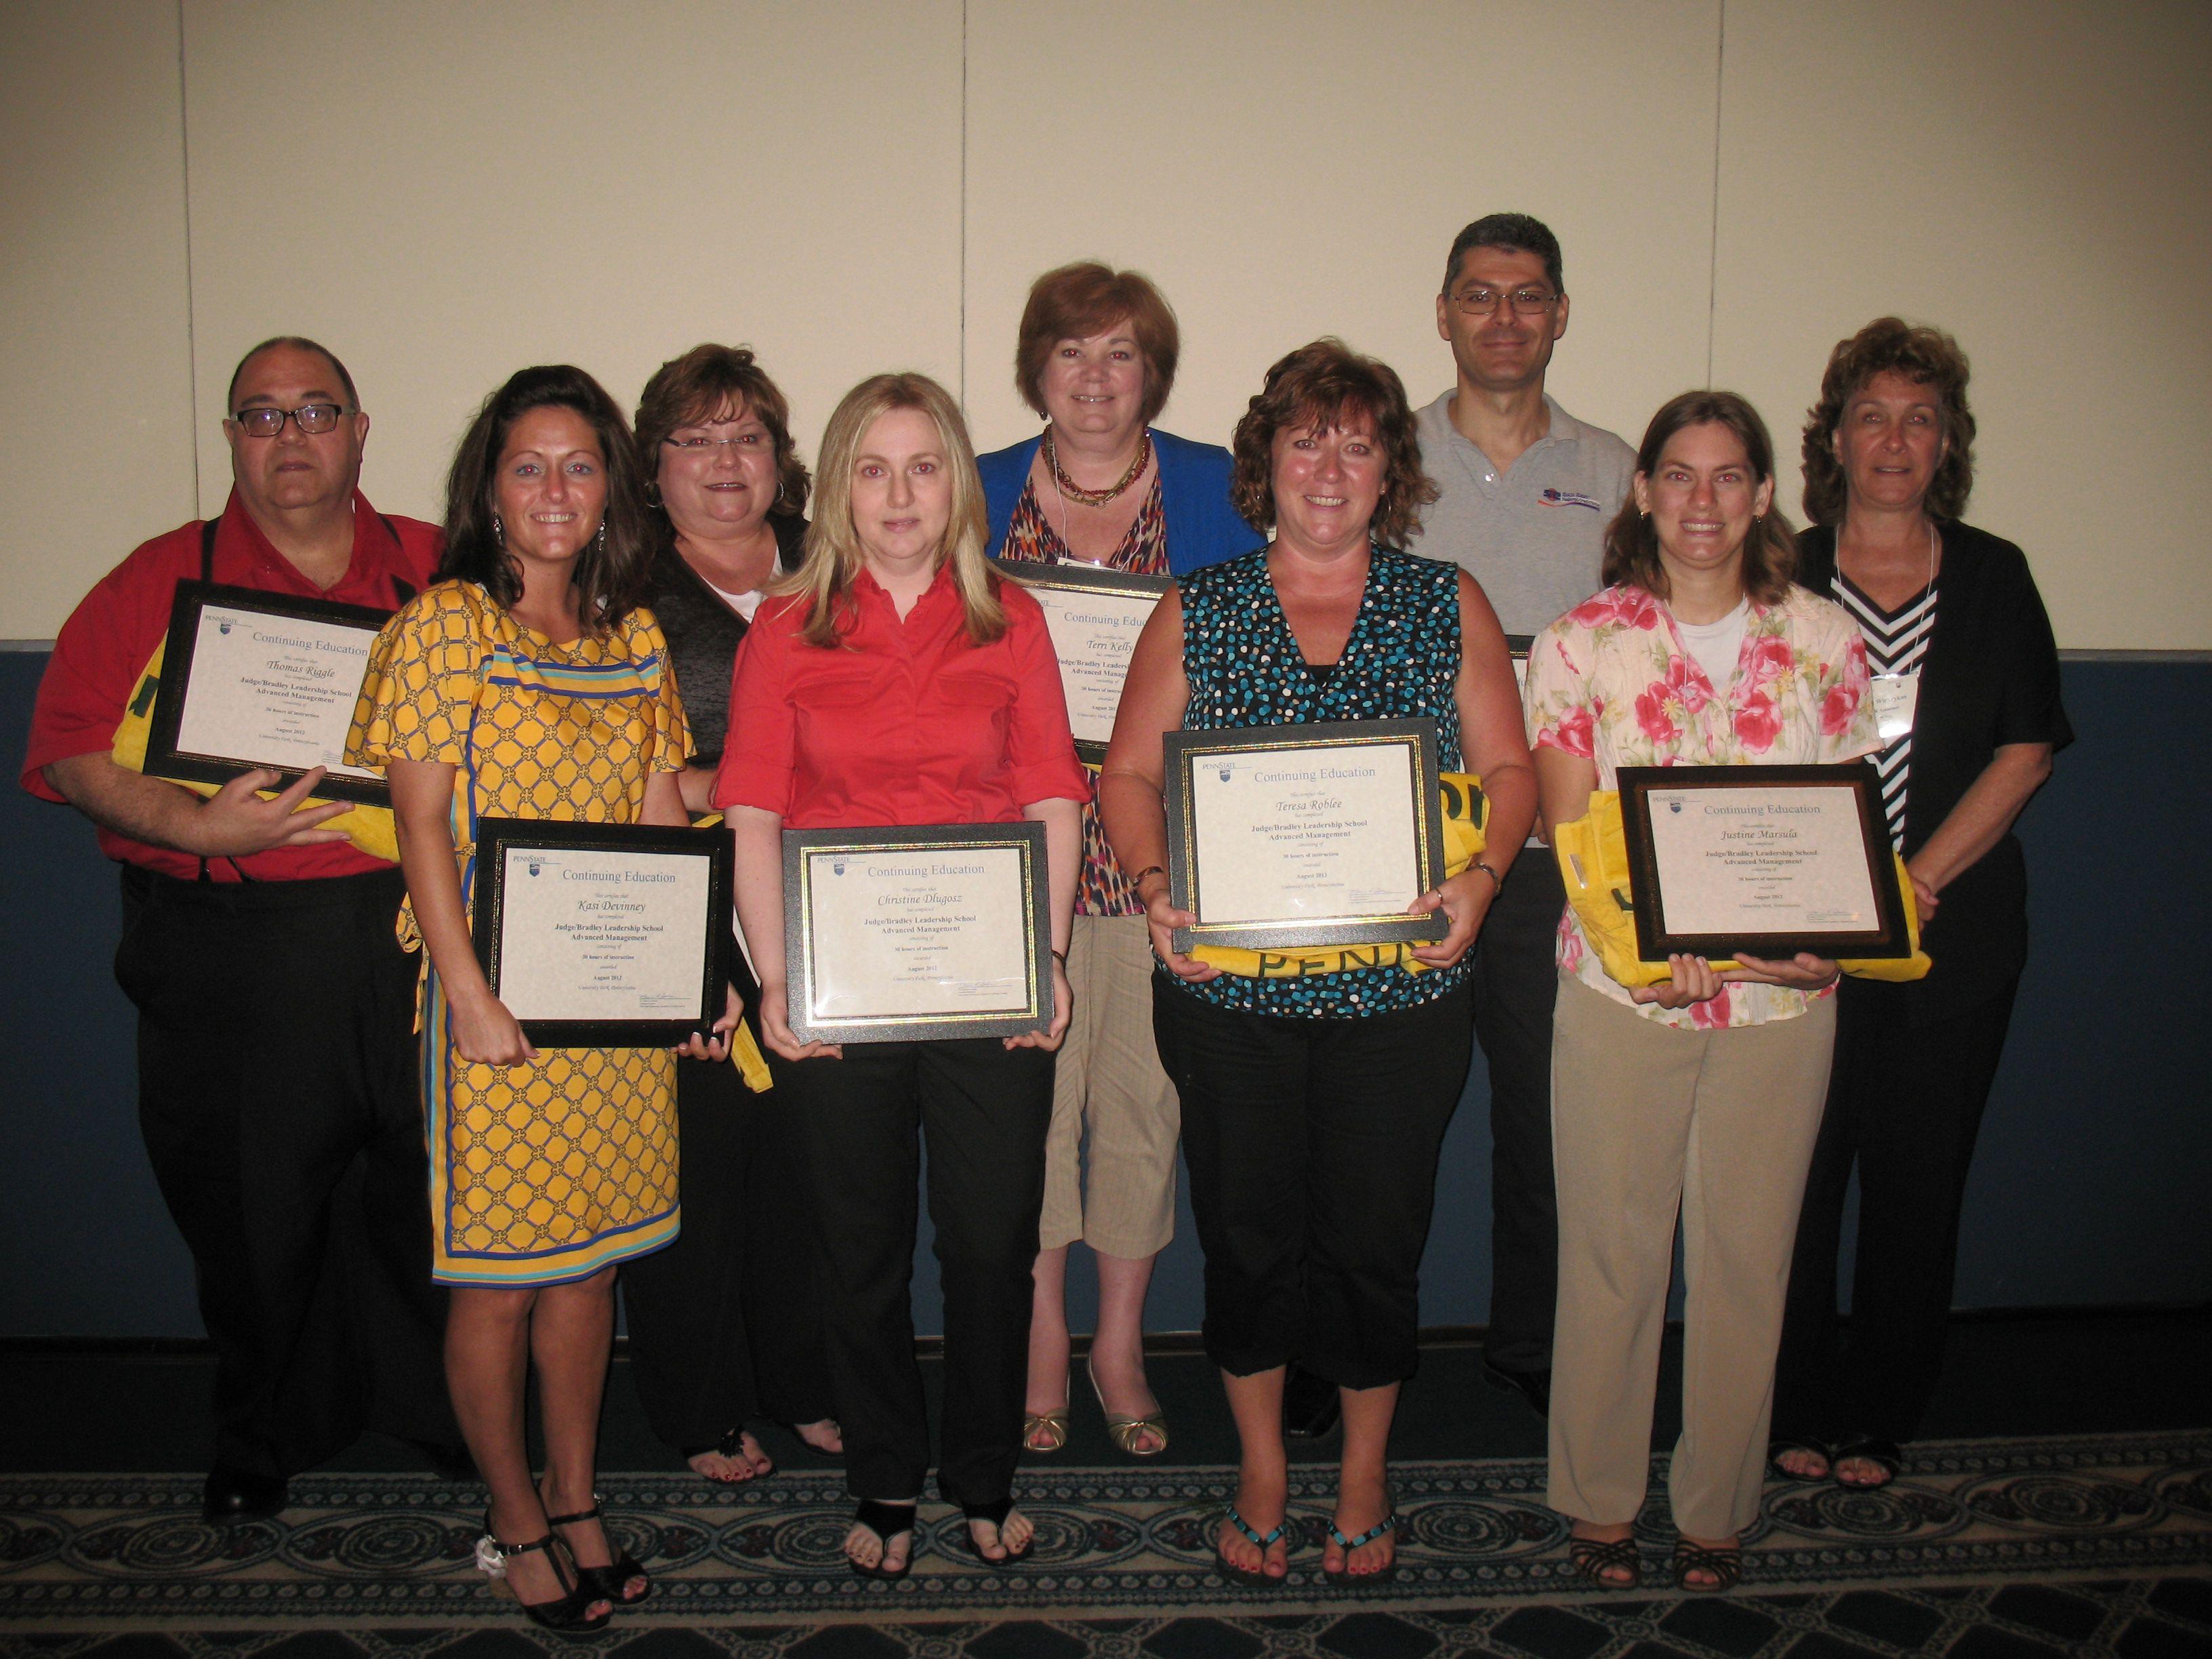 2012 advance management graduates leadership judge leader